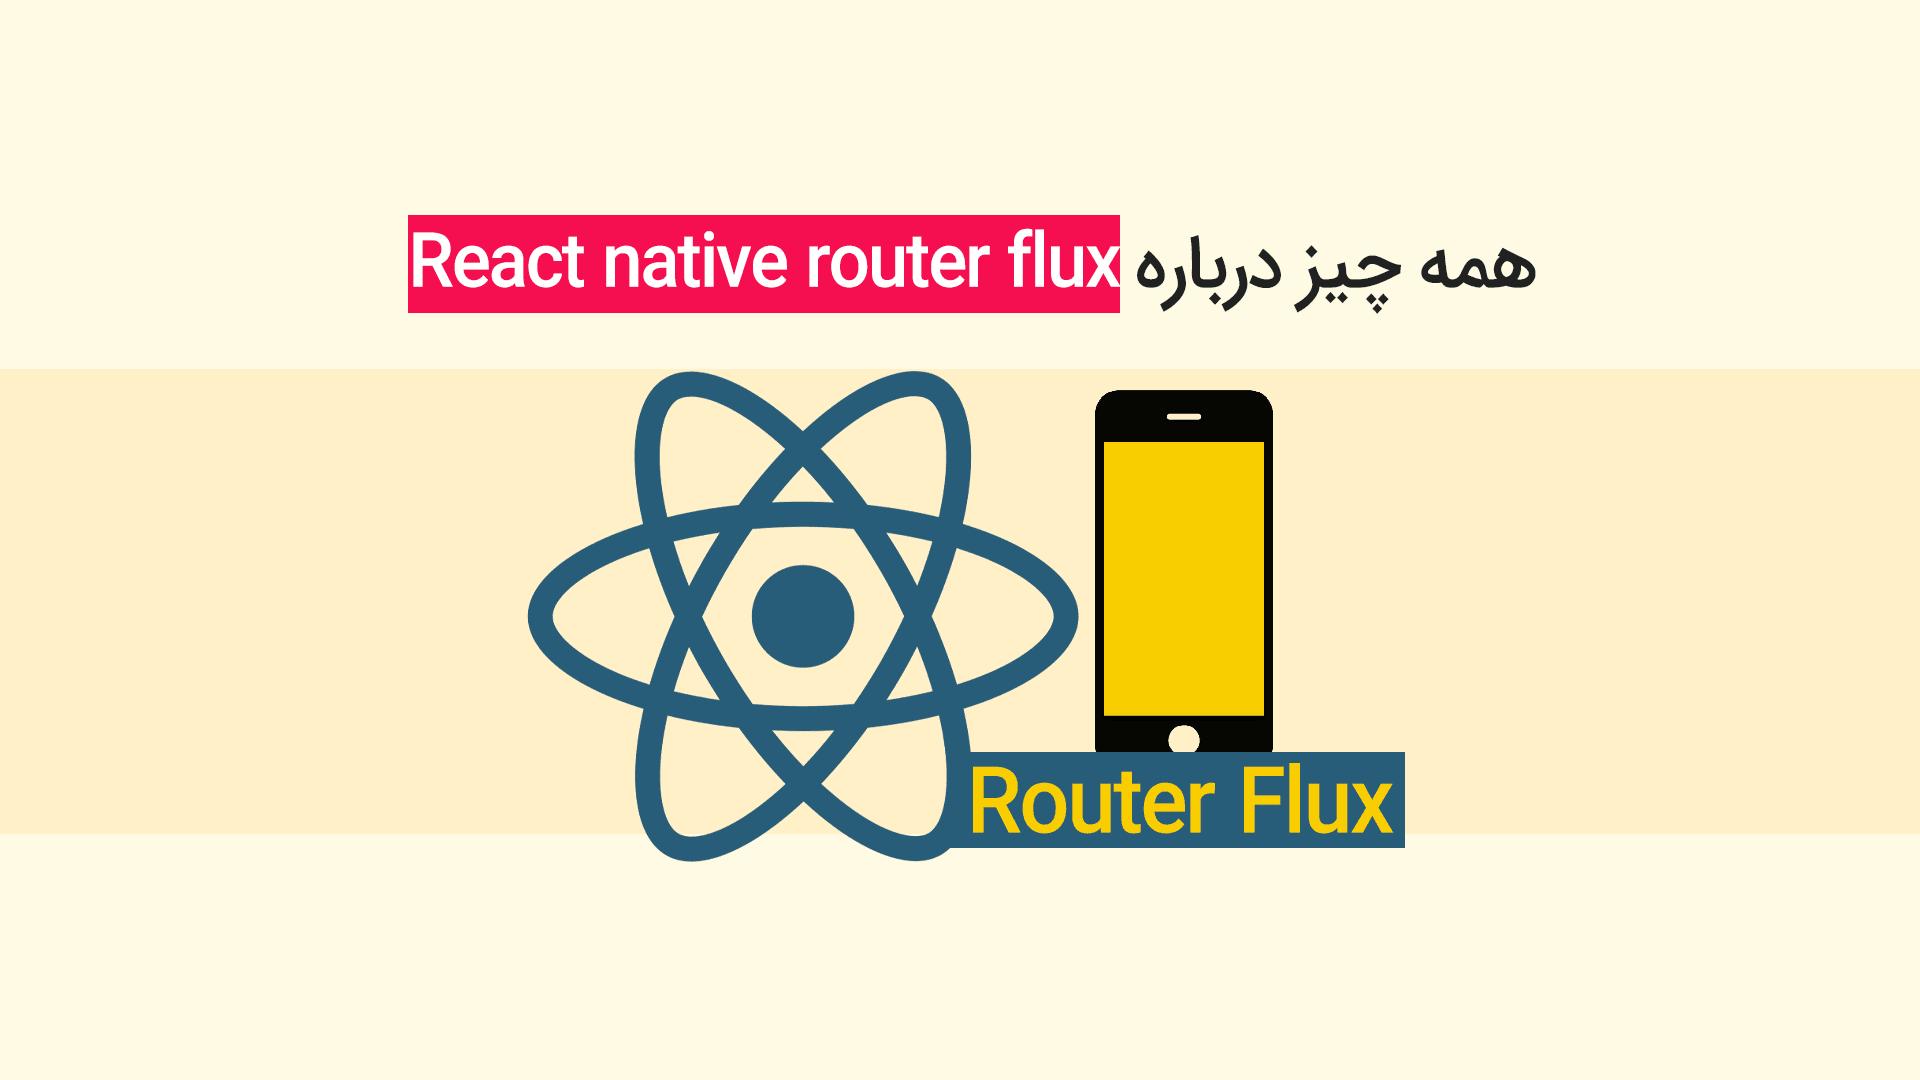 همه چیز درباره React native router flux